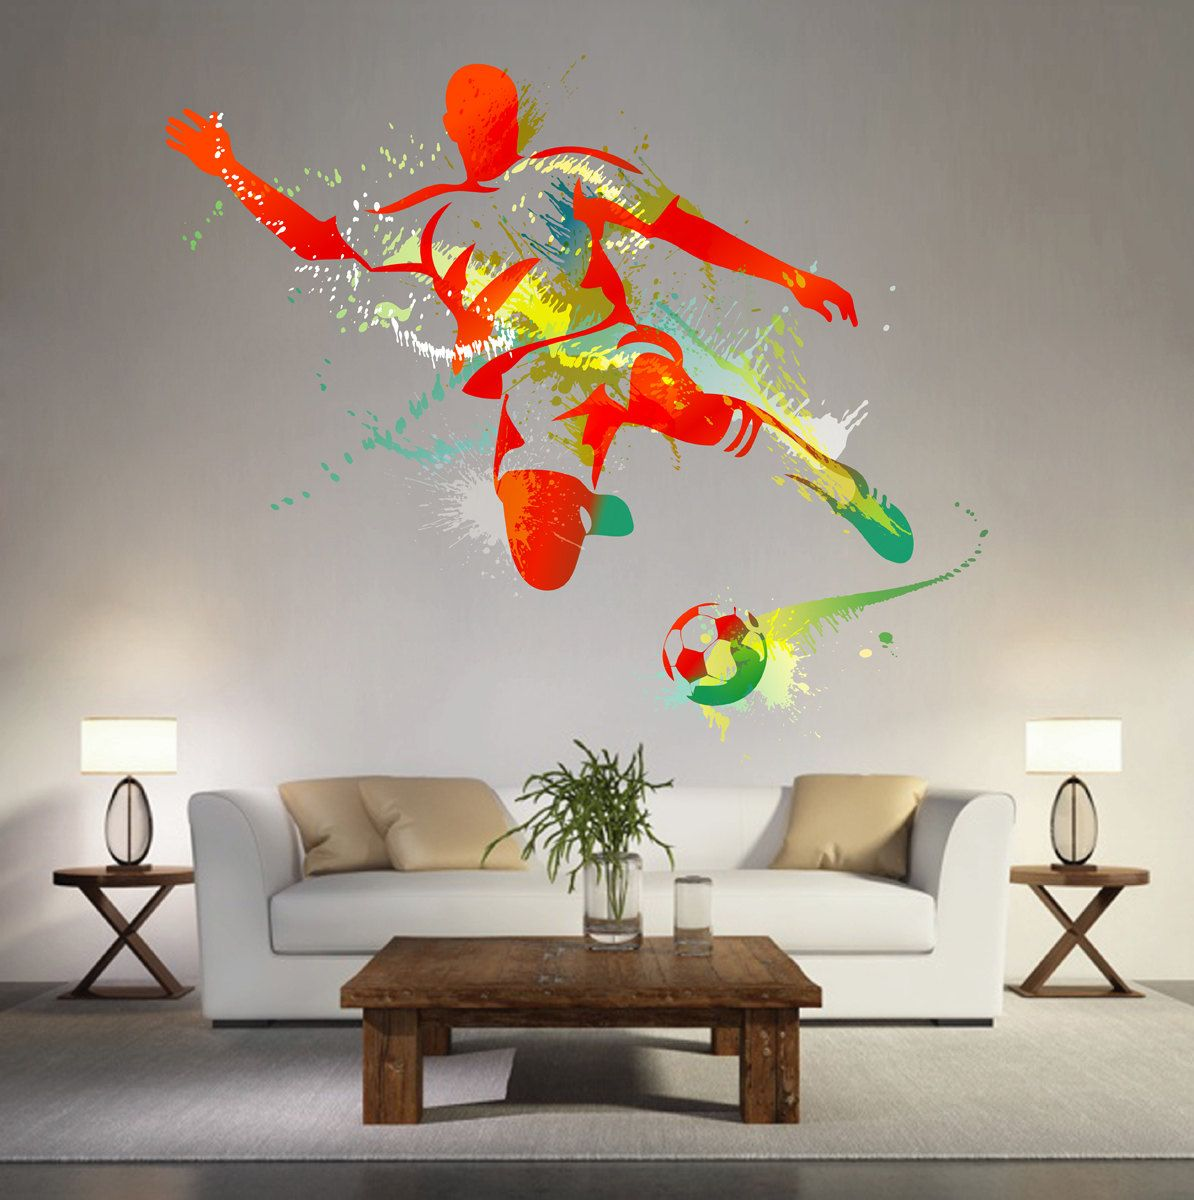 kcik119 Full Color Wall decal soccer football ball sport